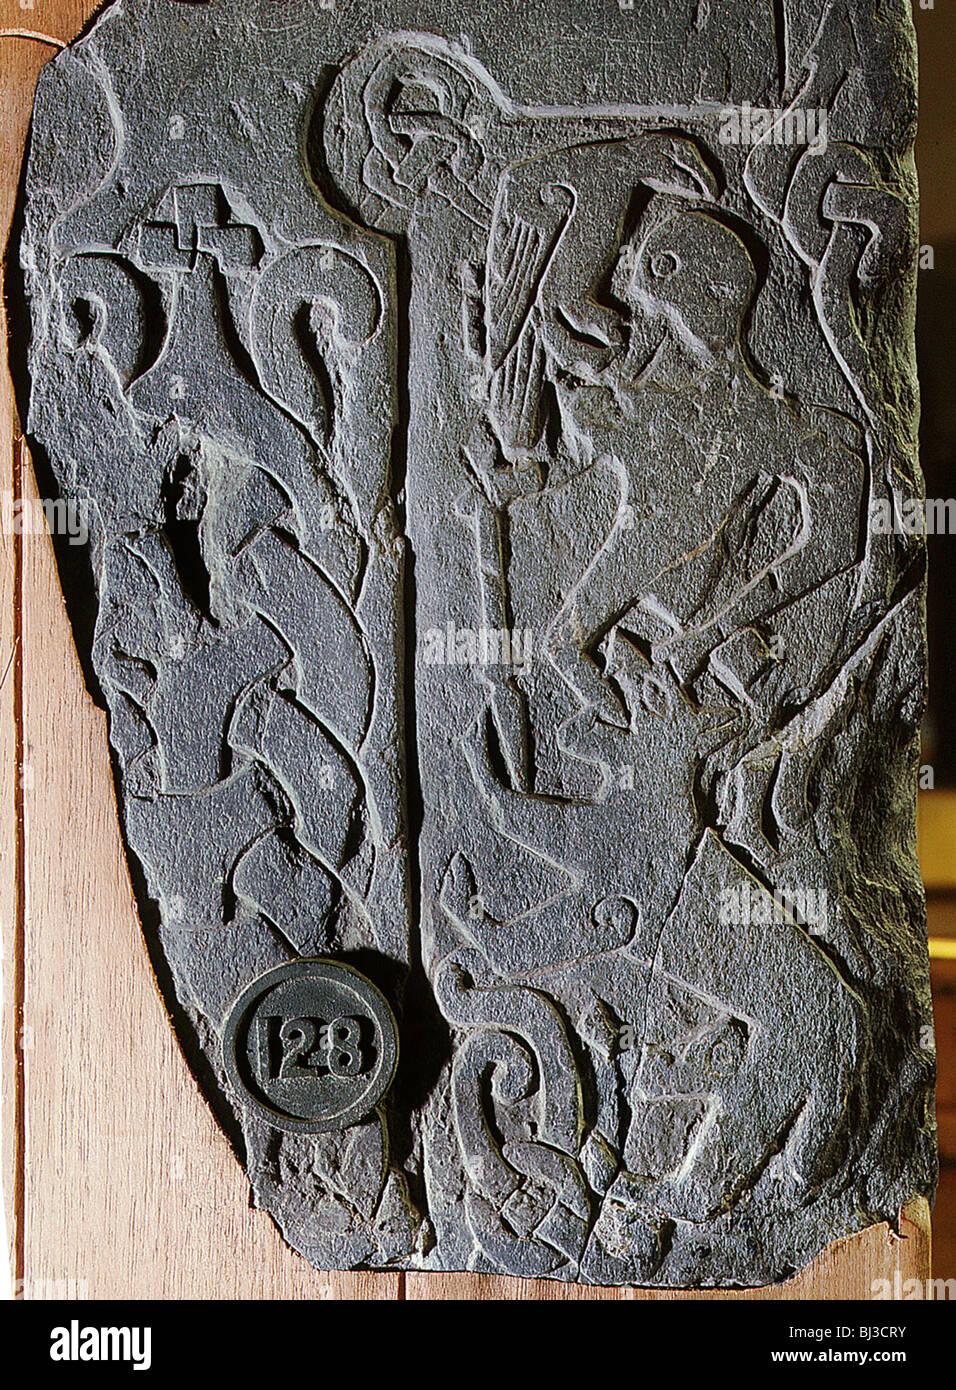 The andreas stone viking isle of man c artist